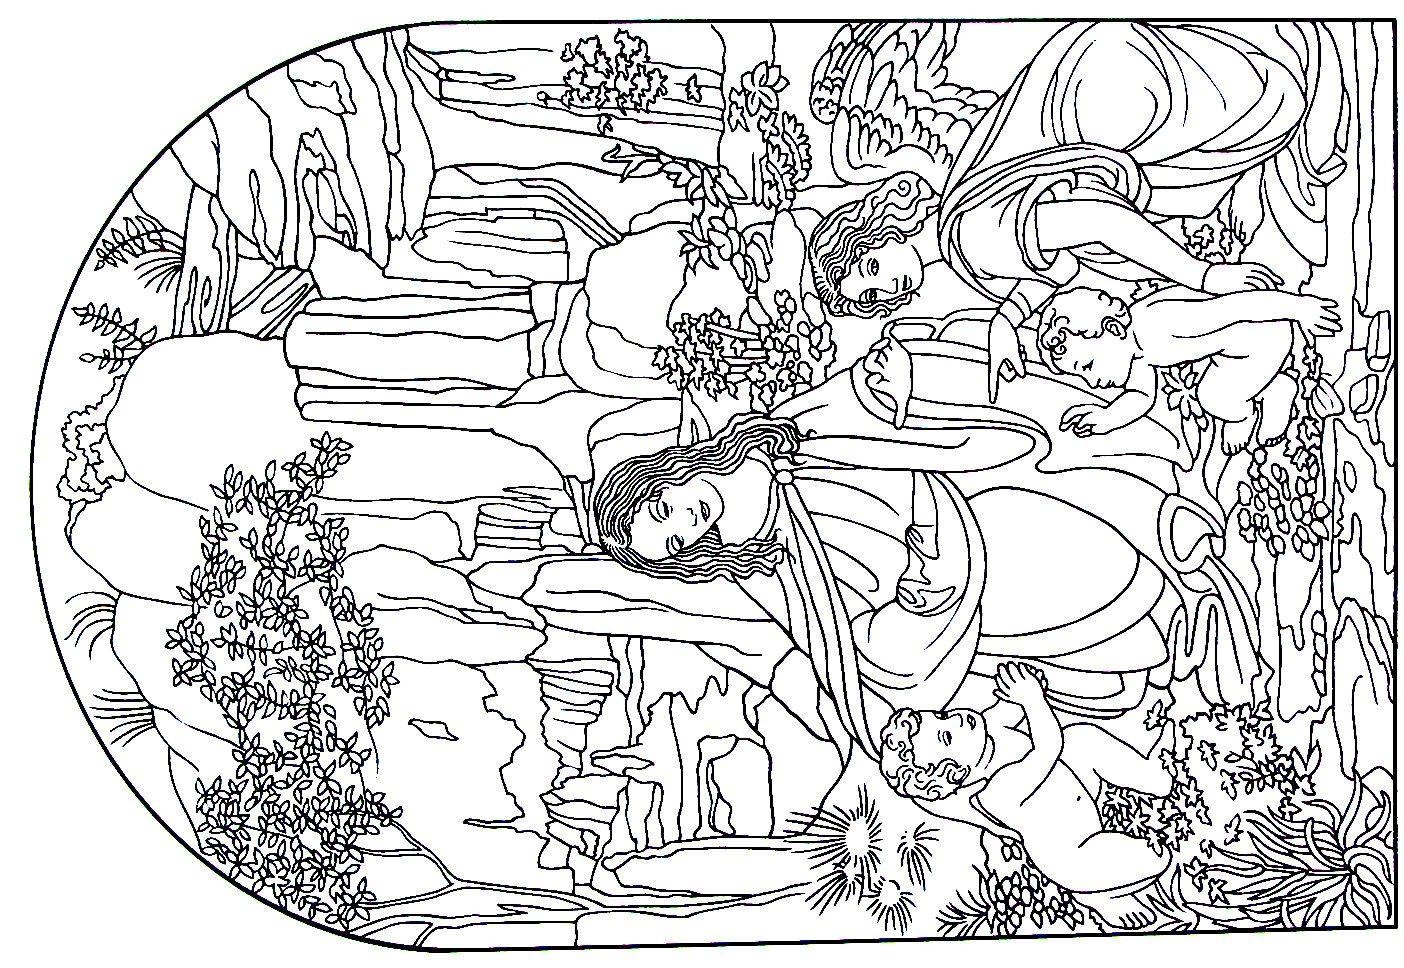 Virgin Of The Rocks Painting By Leonardo Da Vinci Renaissance Printable Coloring Book Page Printable Coloring Book Coloring Pages Coloring Book Pages